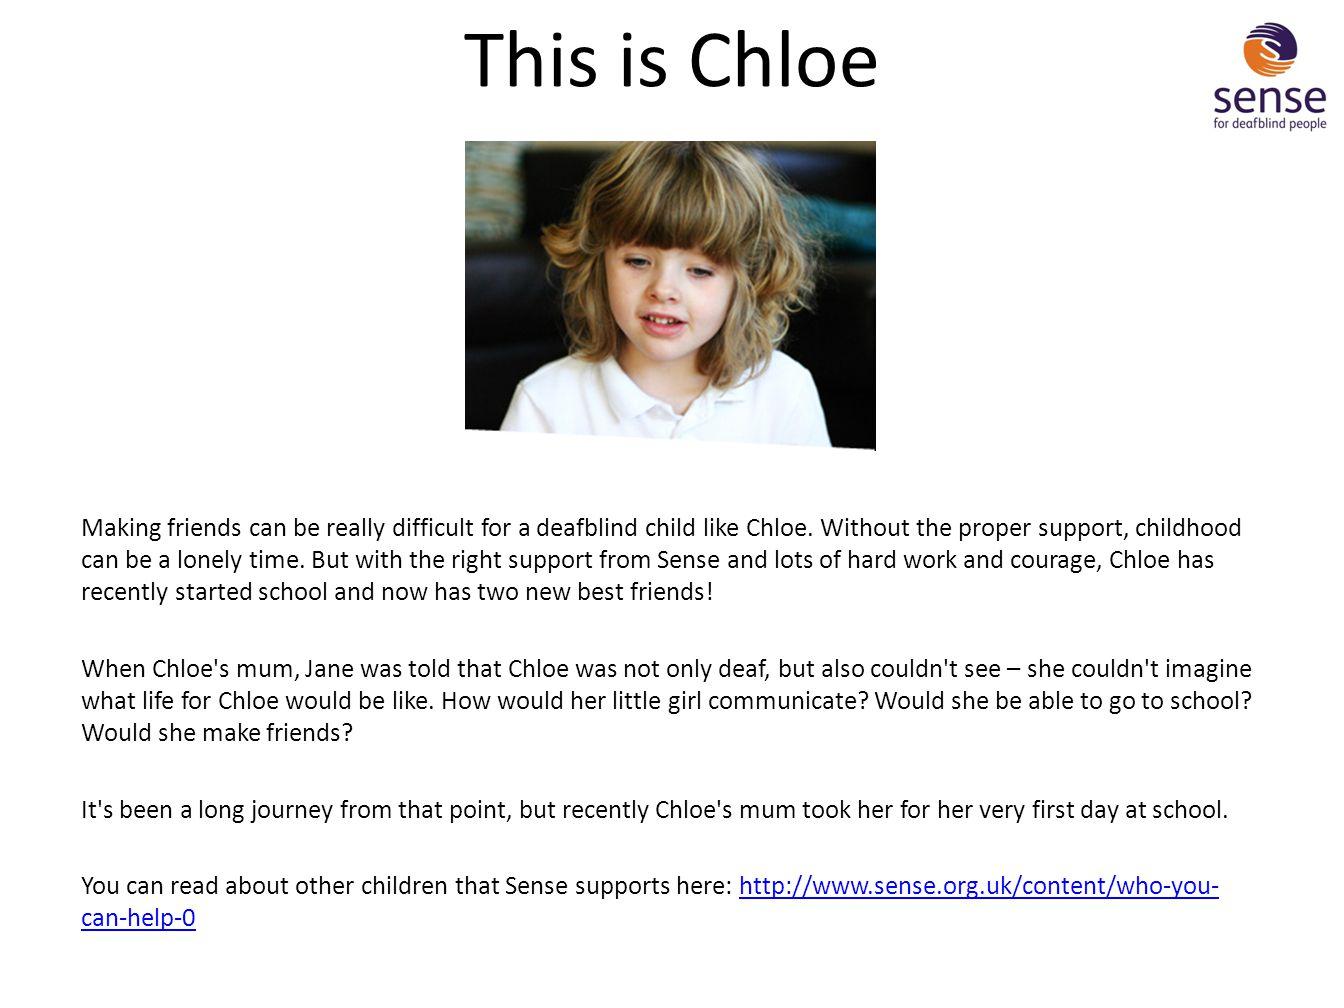 This is Chloe